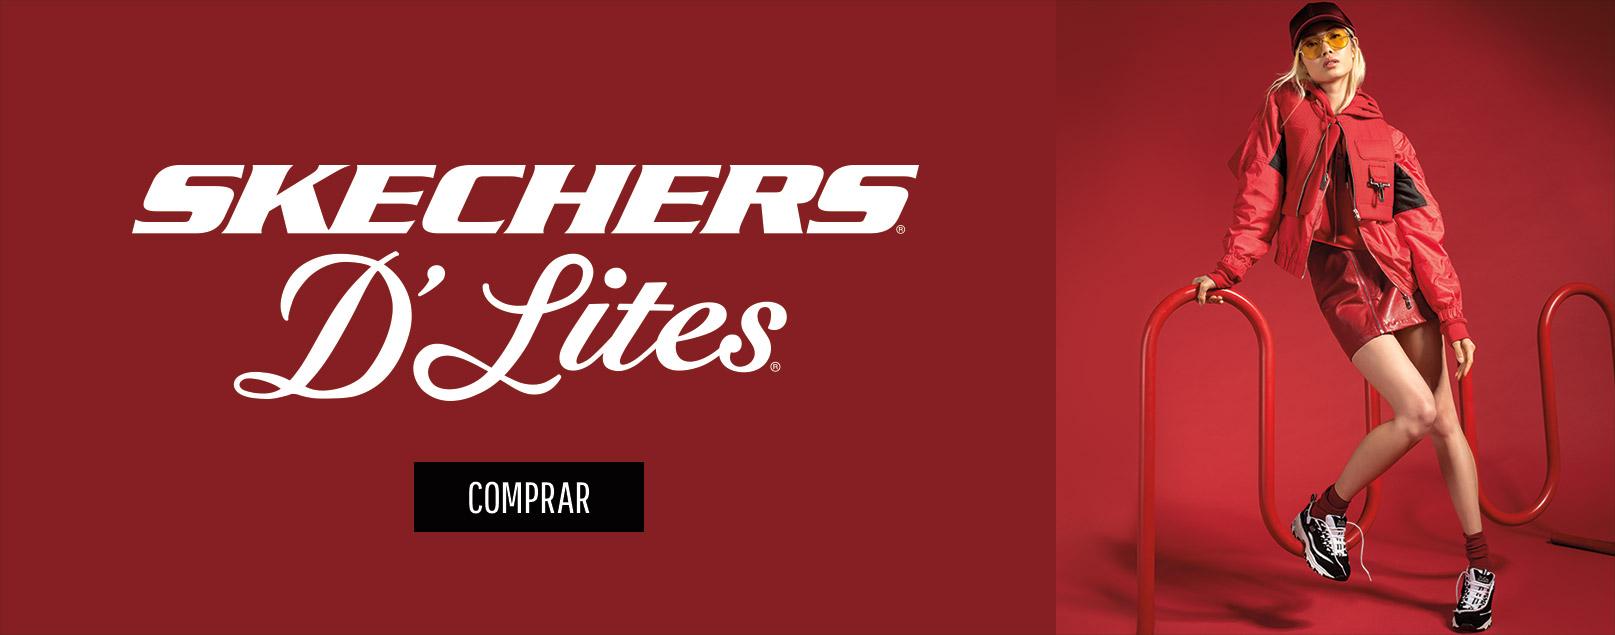 Skechers D´Lites, las chunky shoes de moda. Los 90 han vuelto con Skechers.